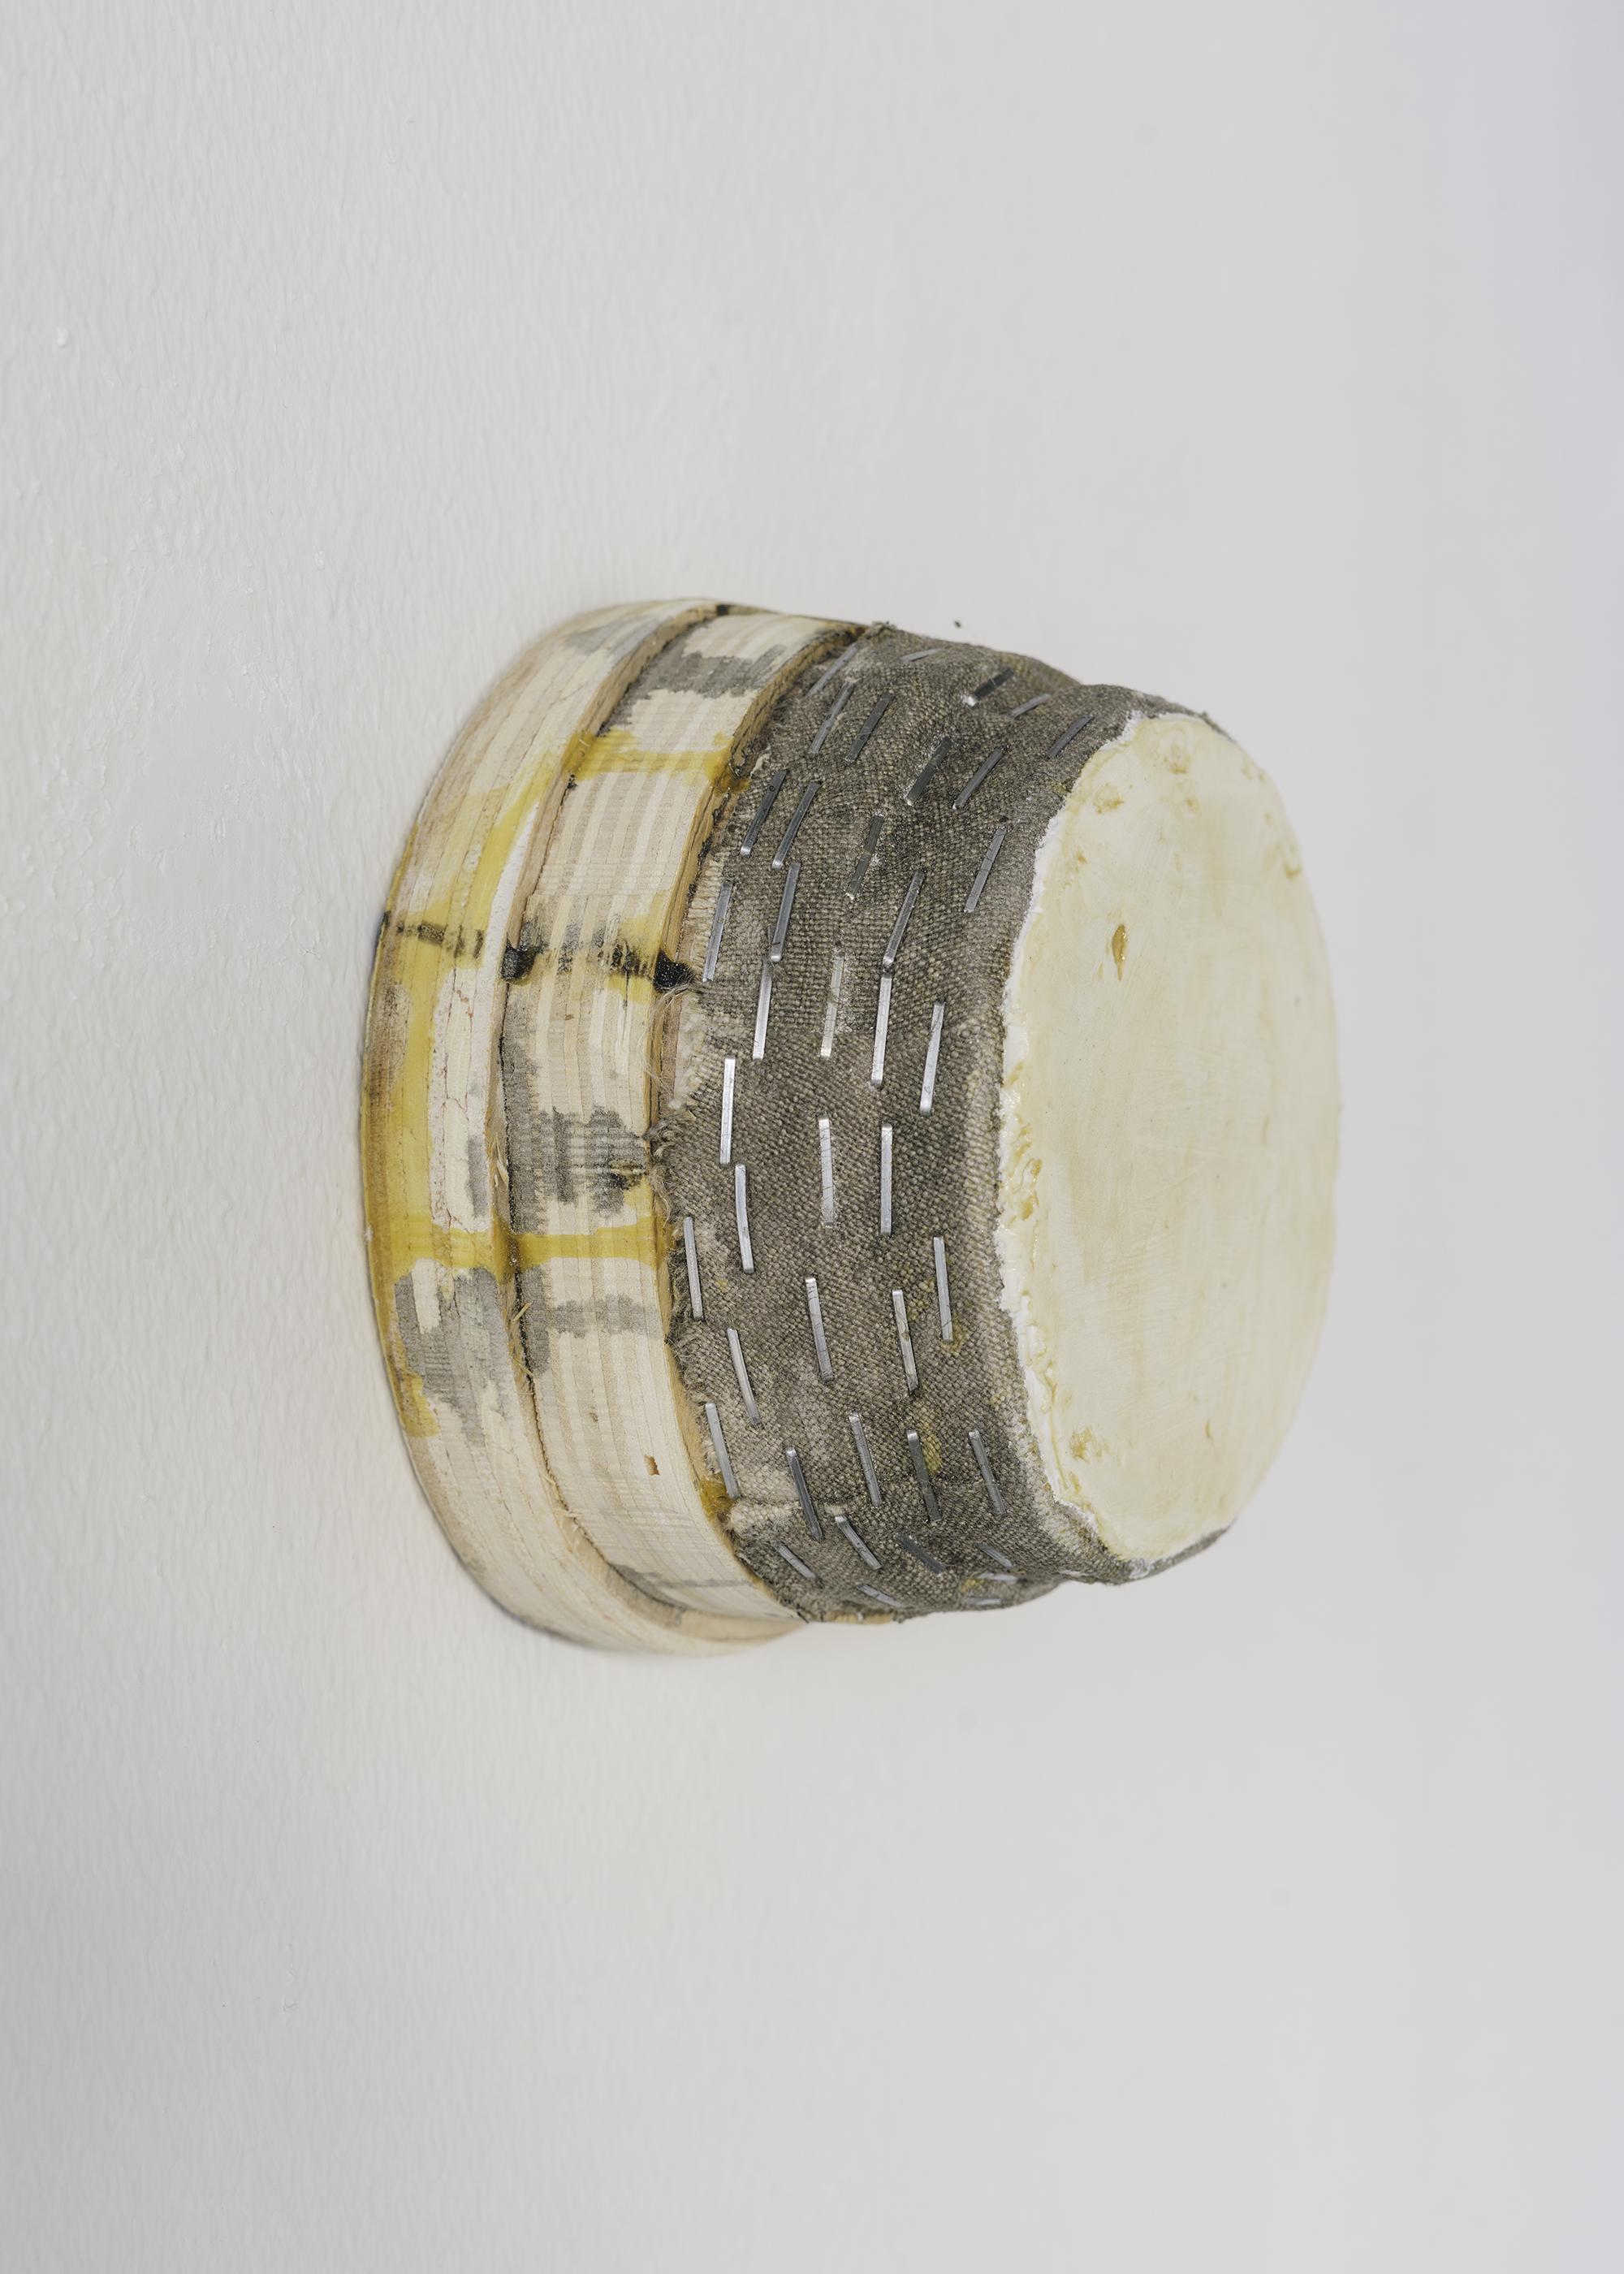 4 Otis Jones - UT Beige, 2021 Acrylic on linen on wood 12CM x 12CM x 7.5CM